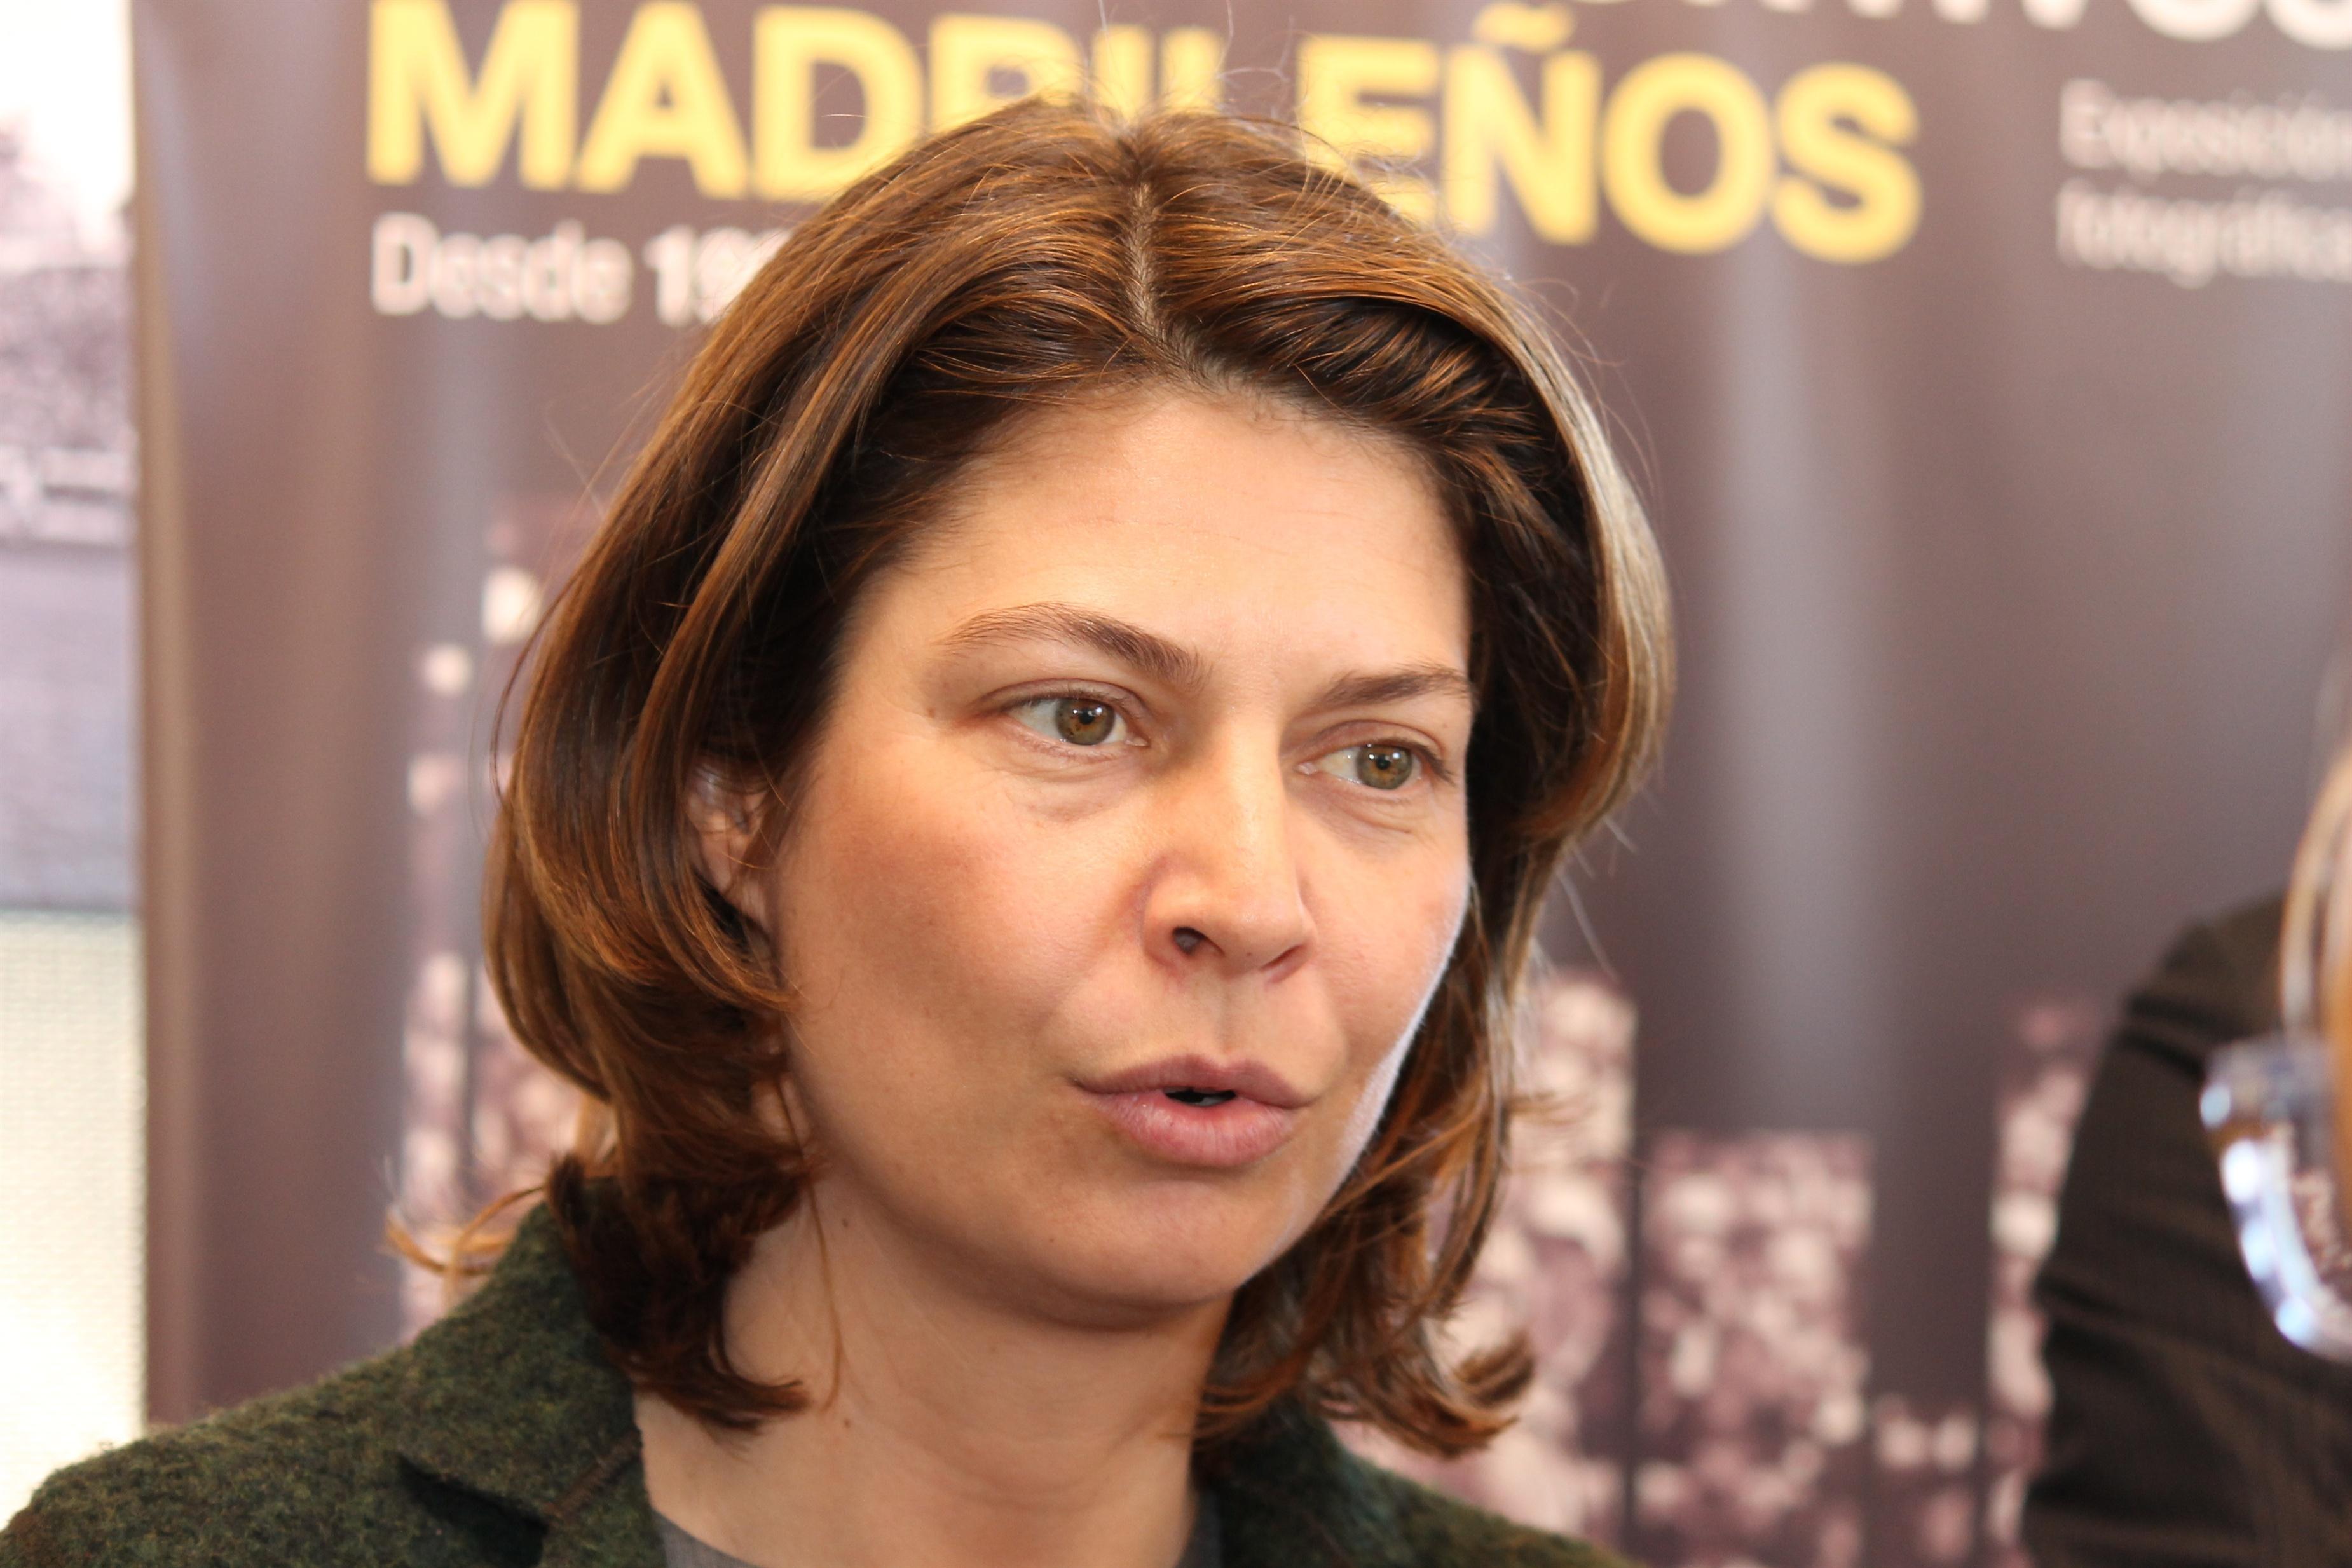 Las Becas Excelencia para el próximo curso solo irán dirigidas a alumnos que hayan finalizado Bachillerato en Madrid